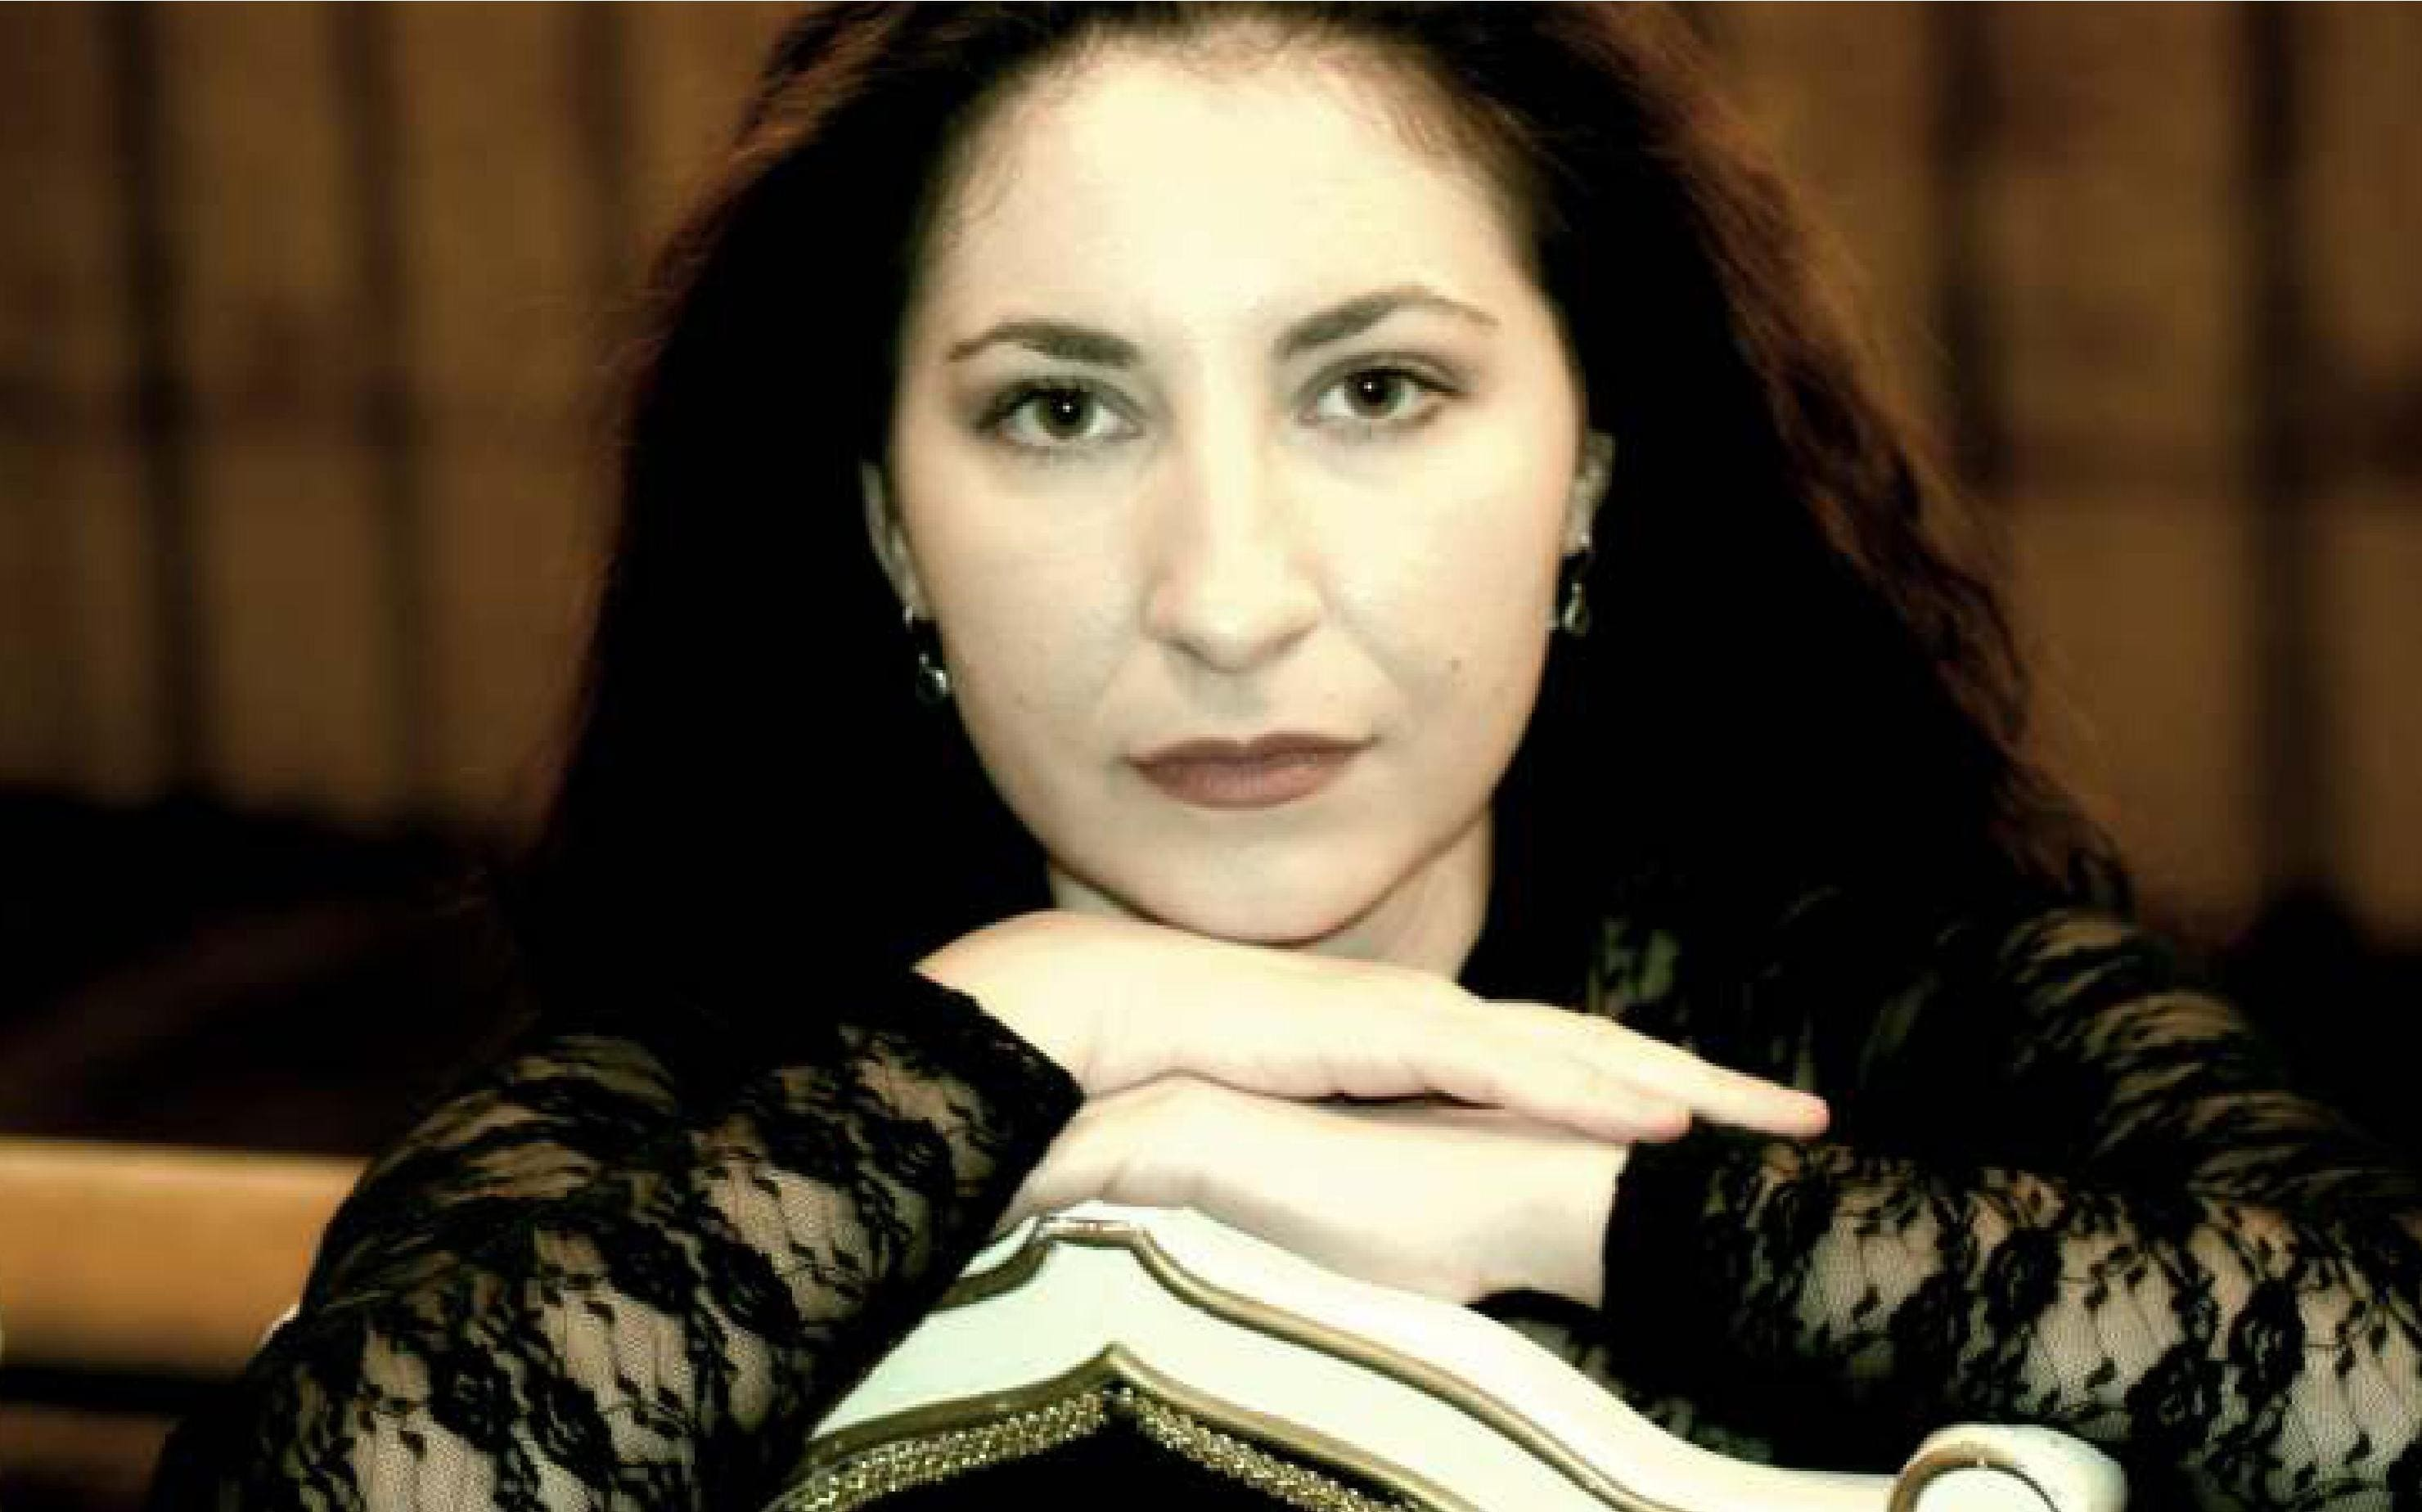 Andreea Nanu